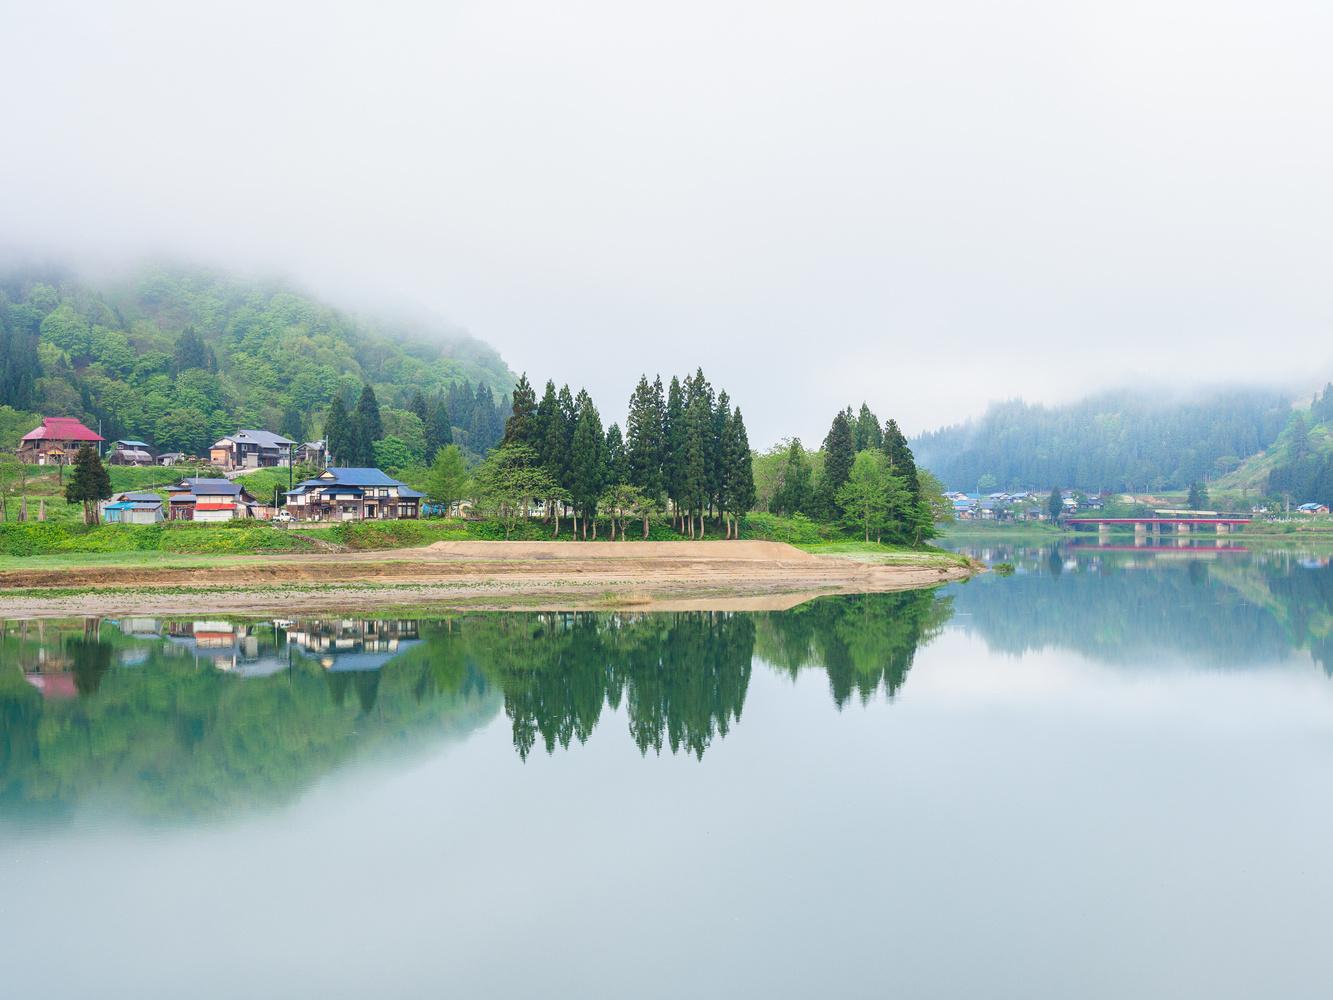 Village of an illusion by Hiroto Kanno